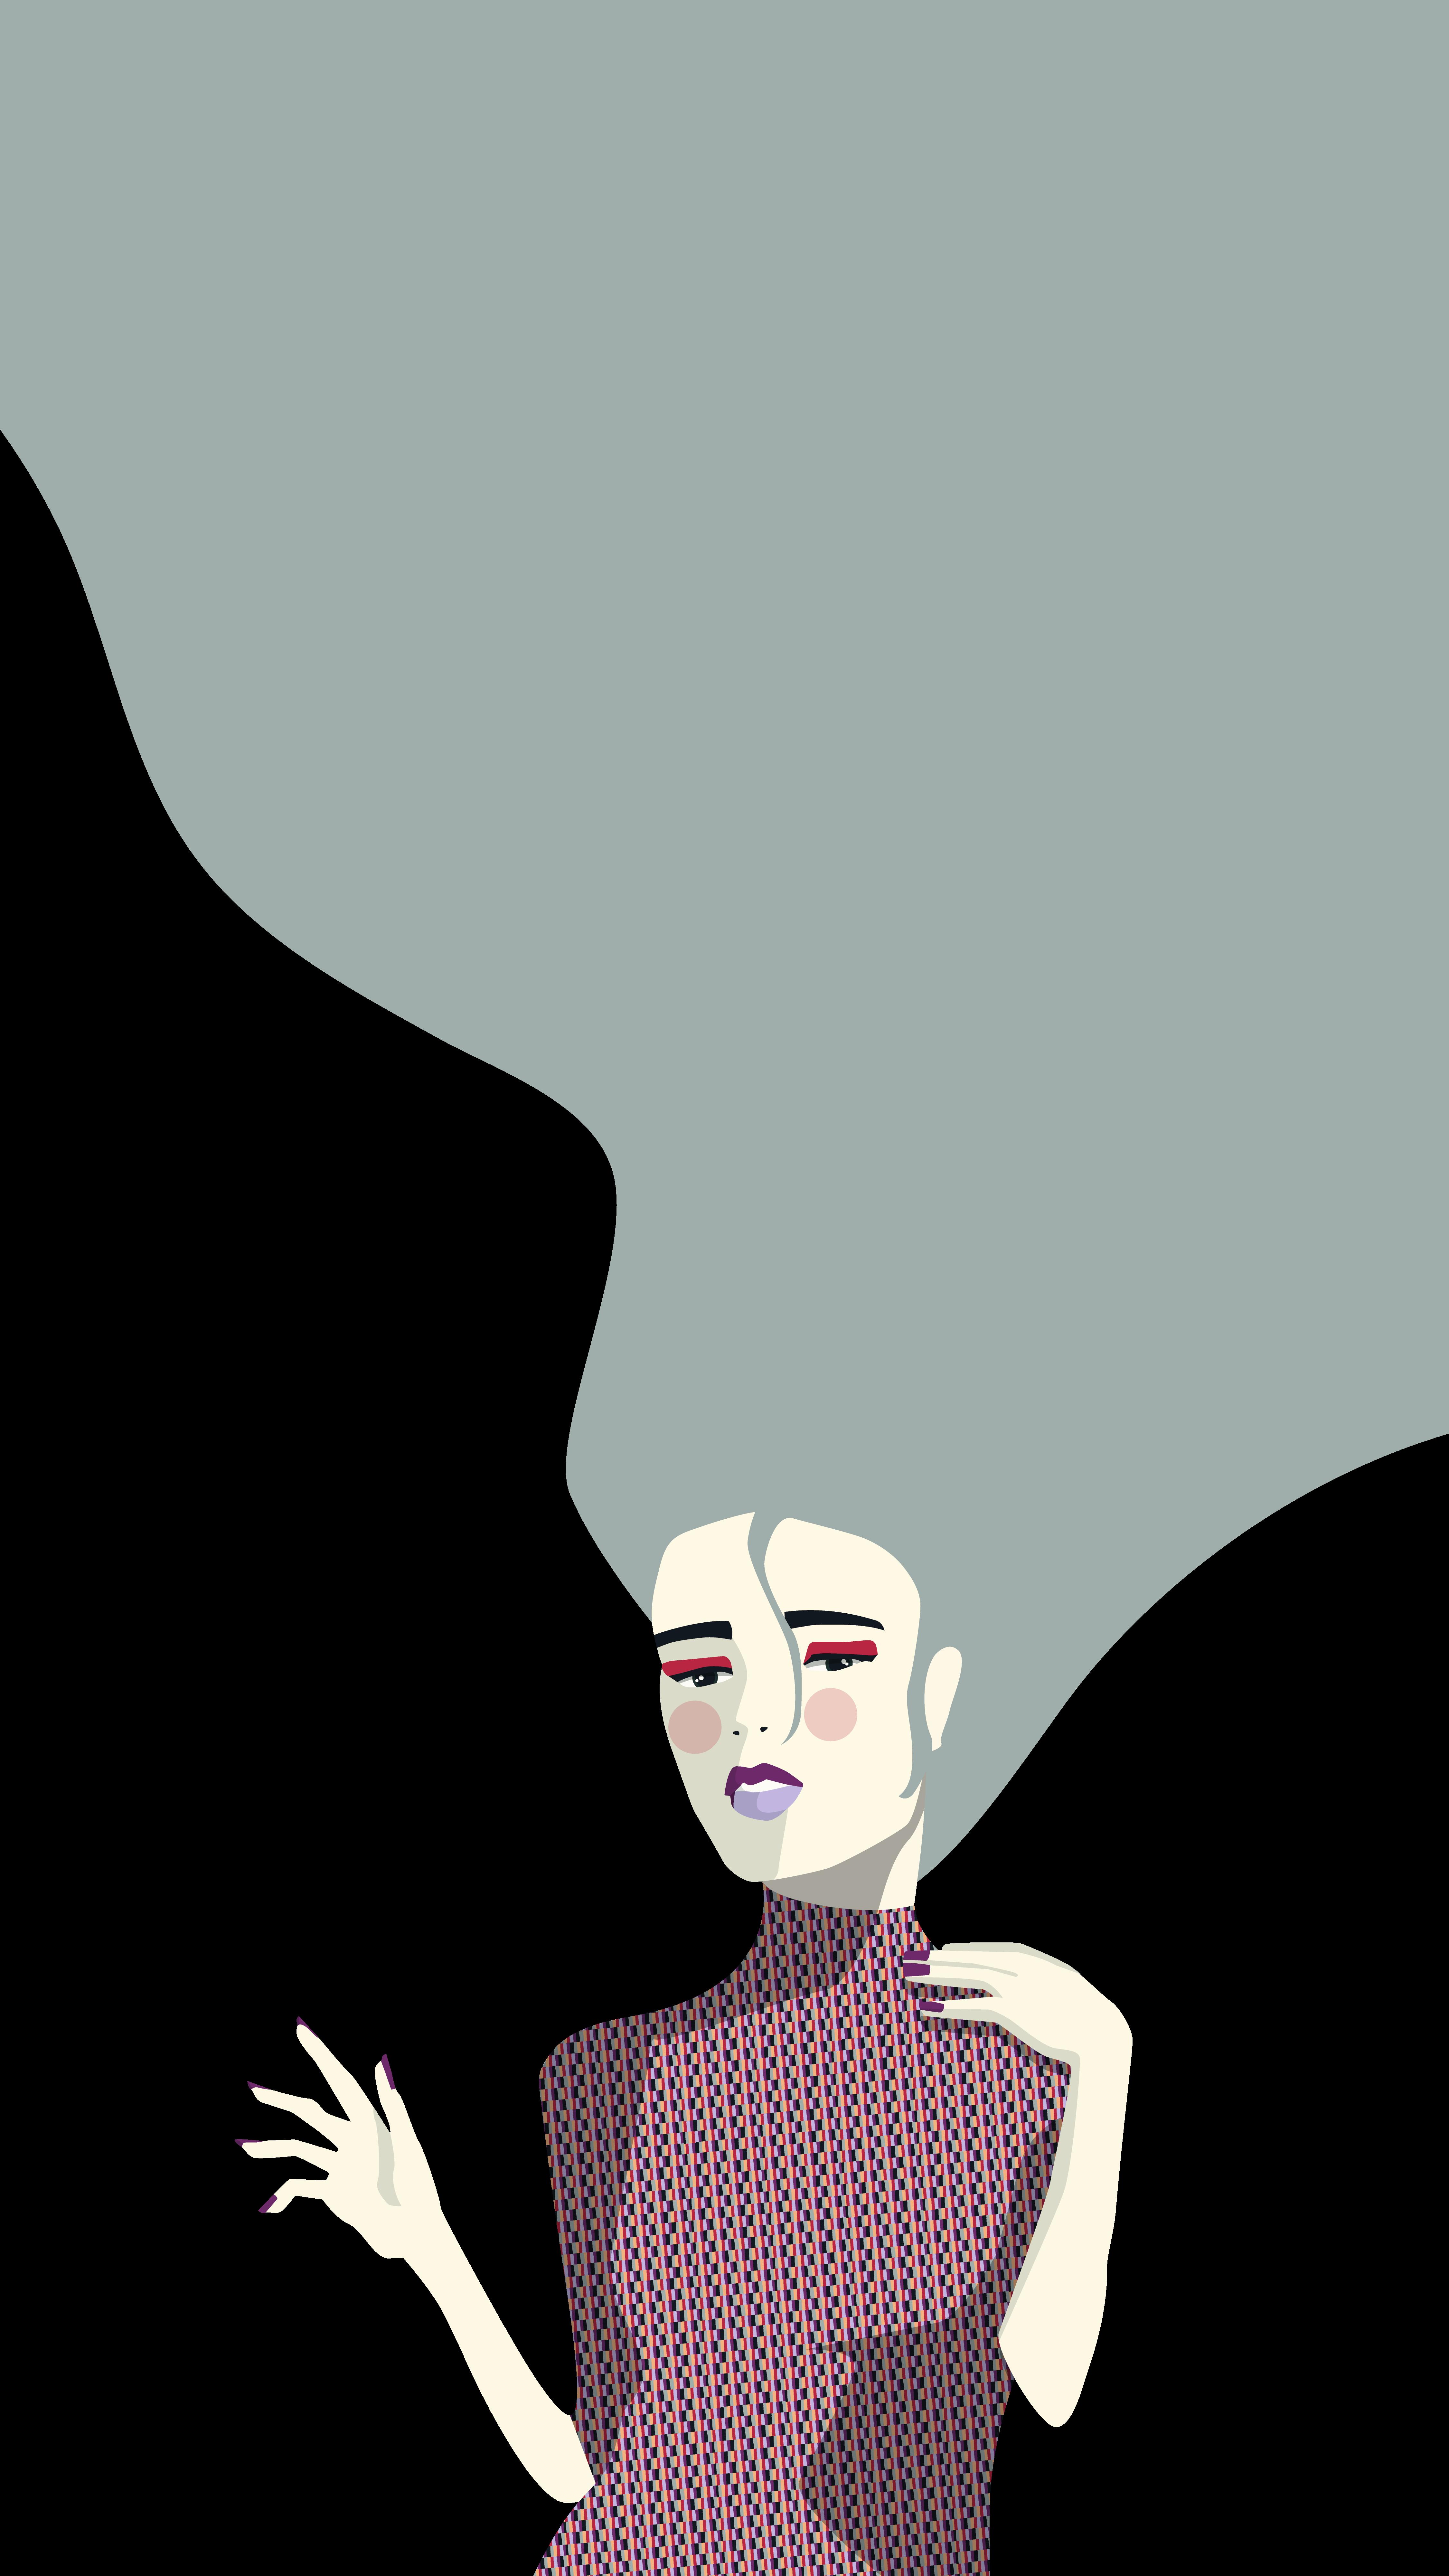 modeisme illustrations